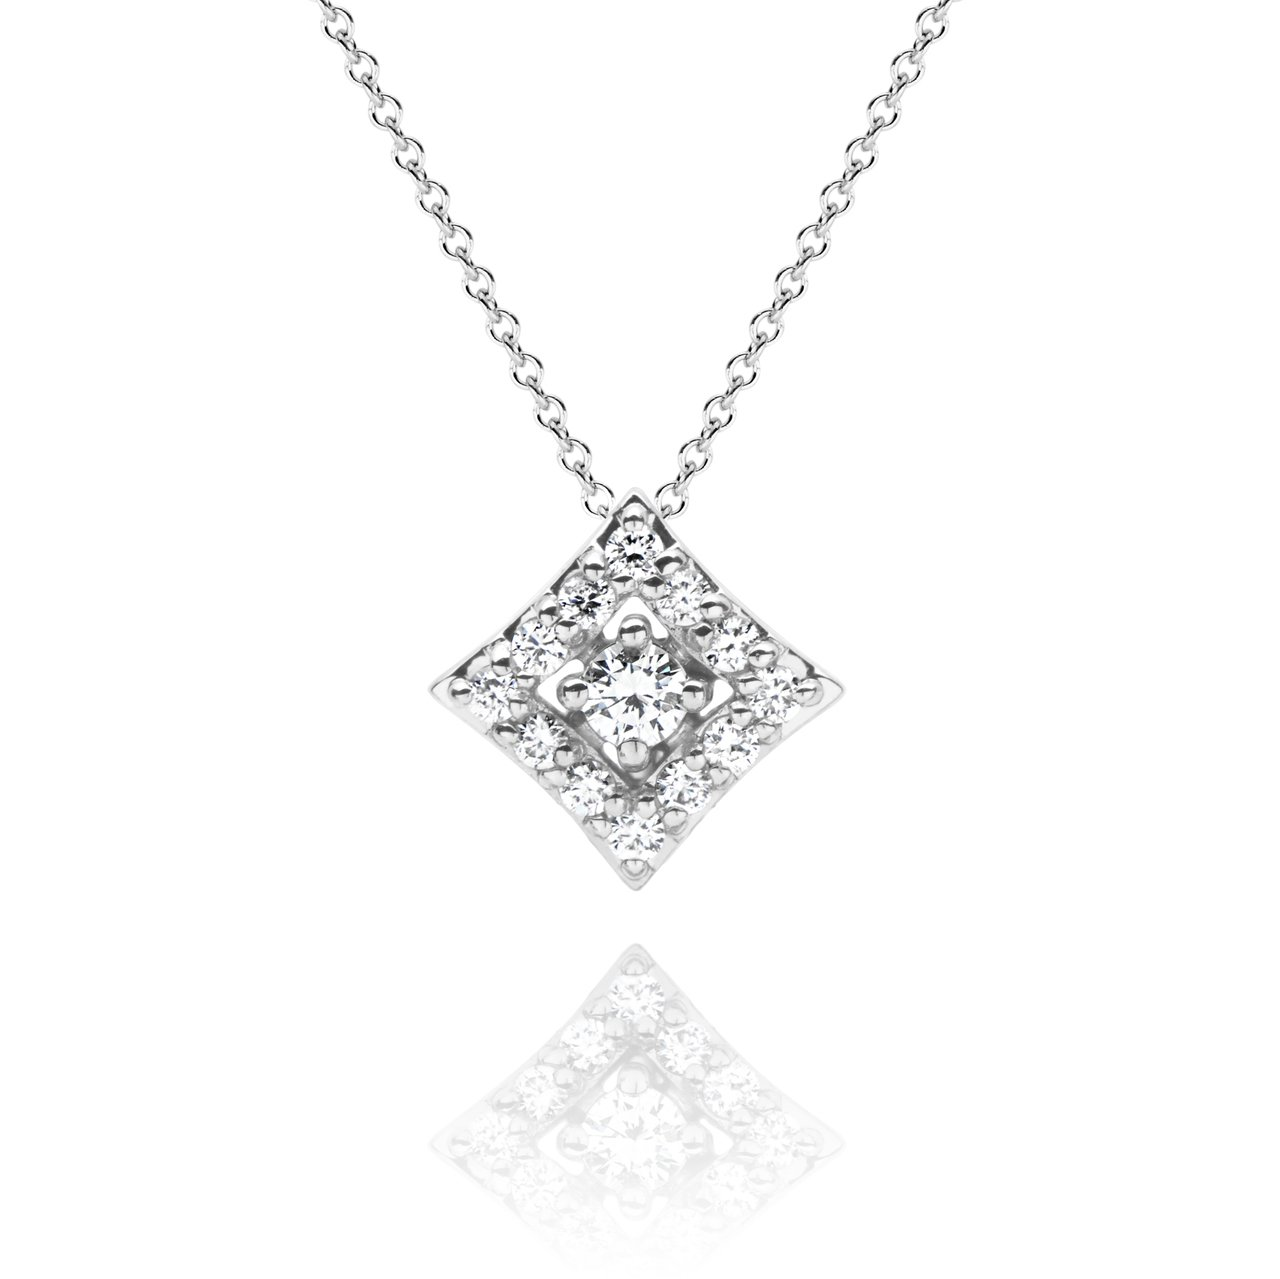 Regalo Diamond Pendant in 14k White Gold by GiGi Ferranti